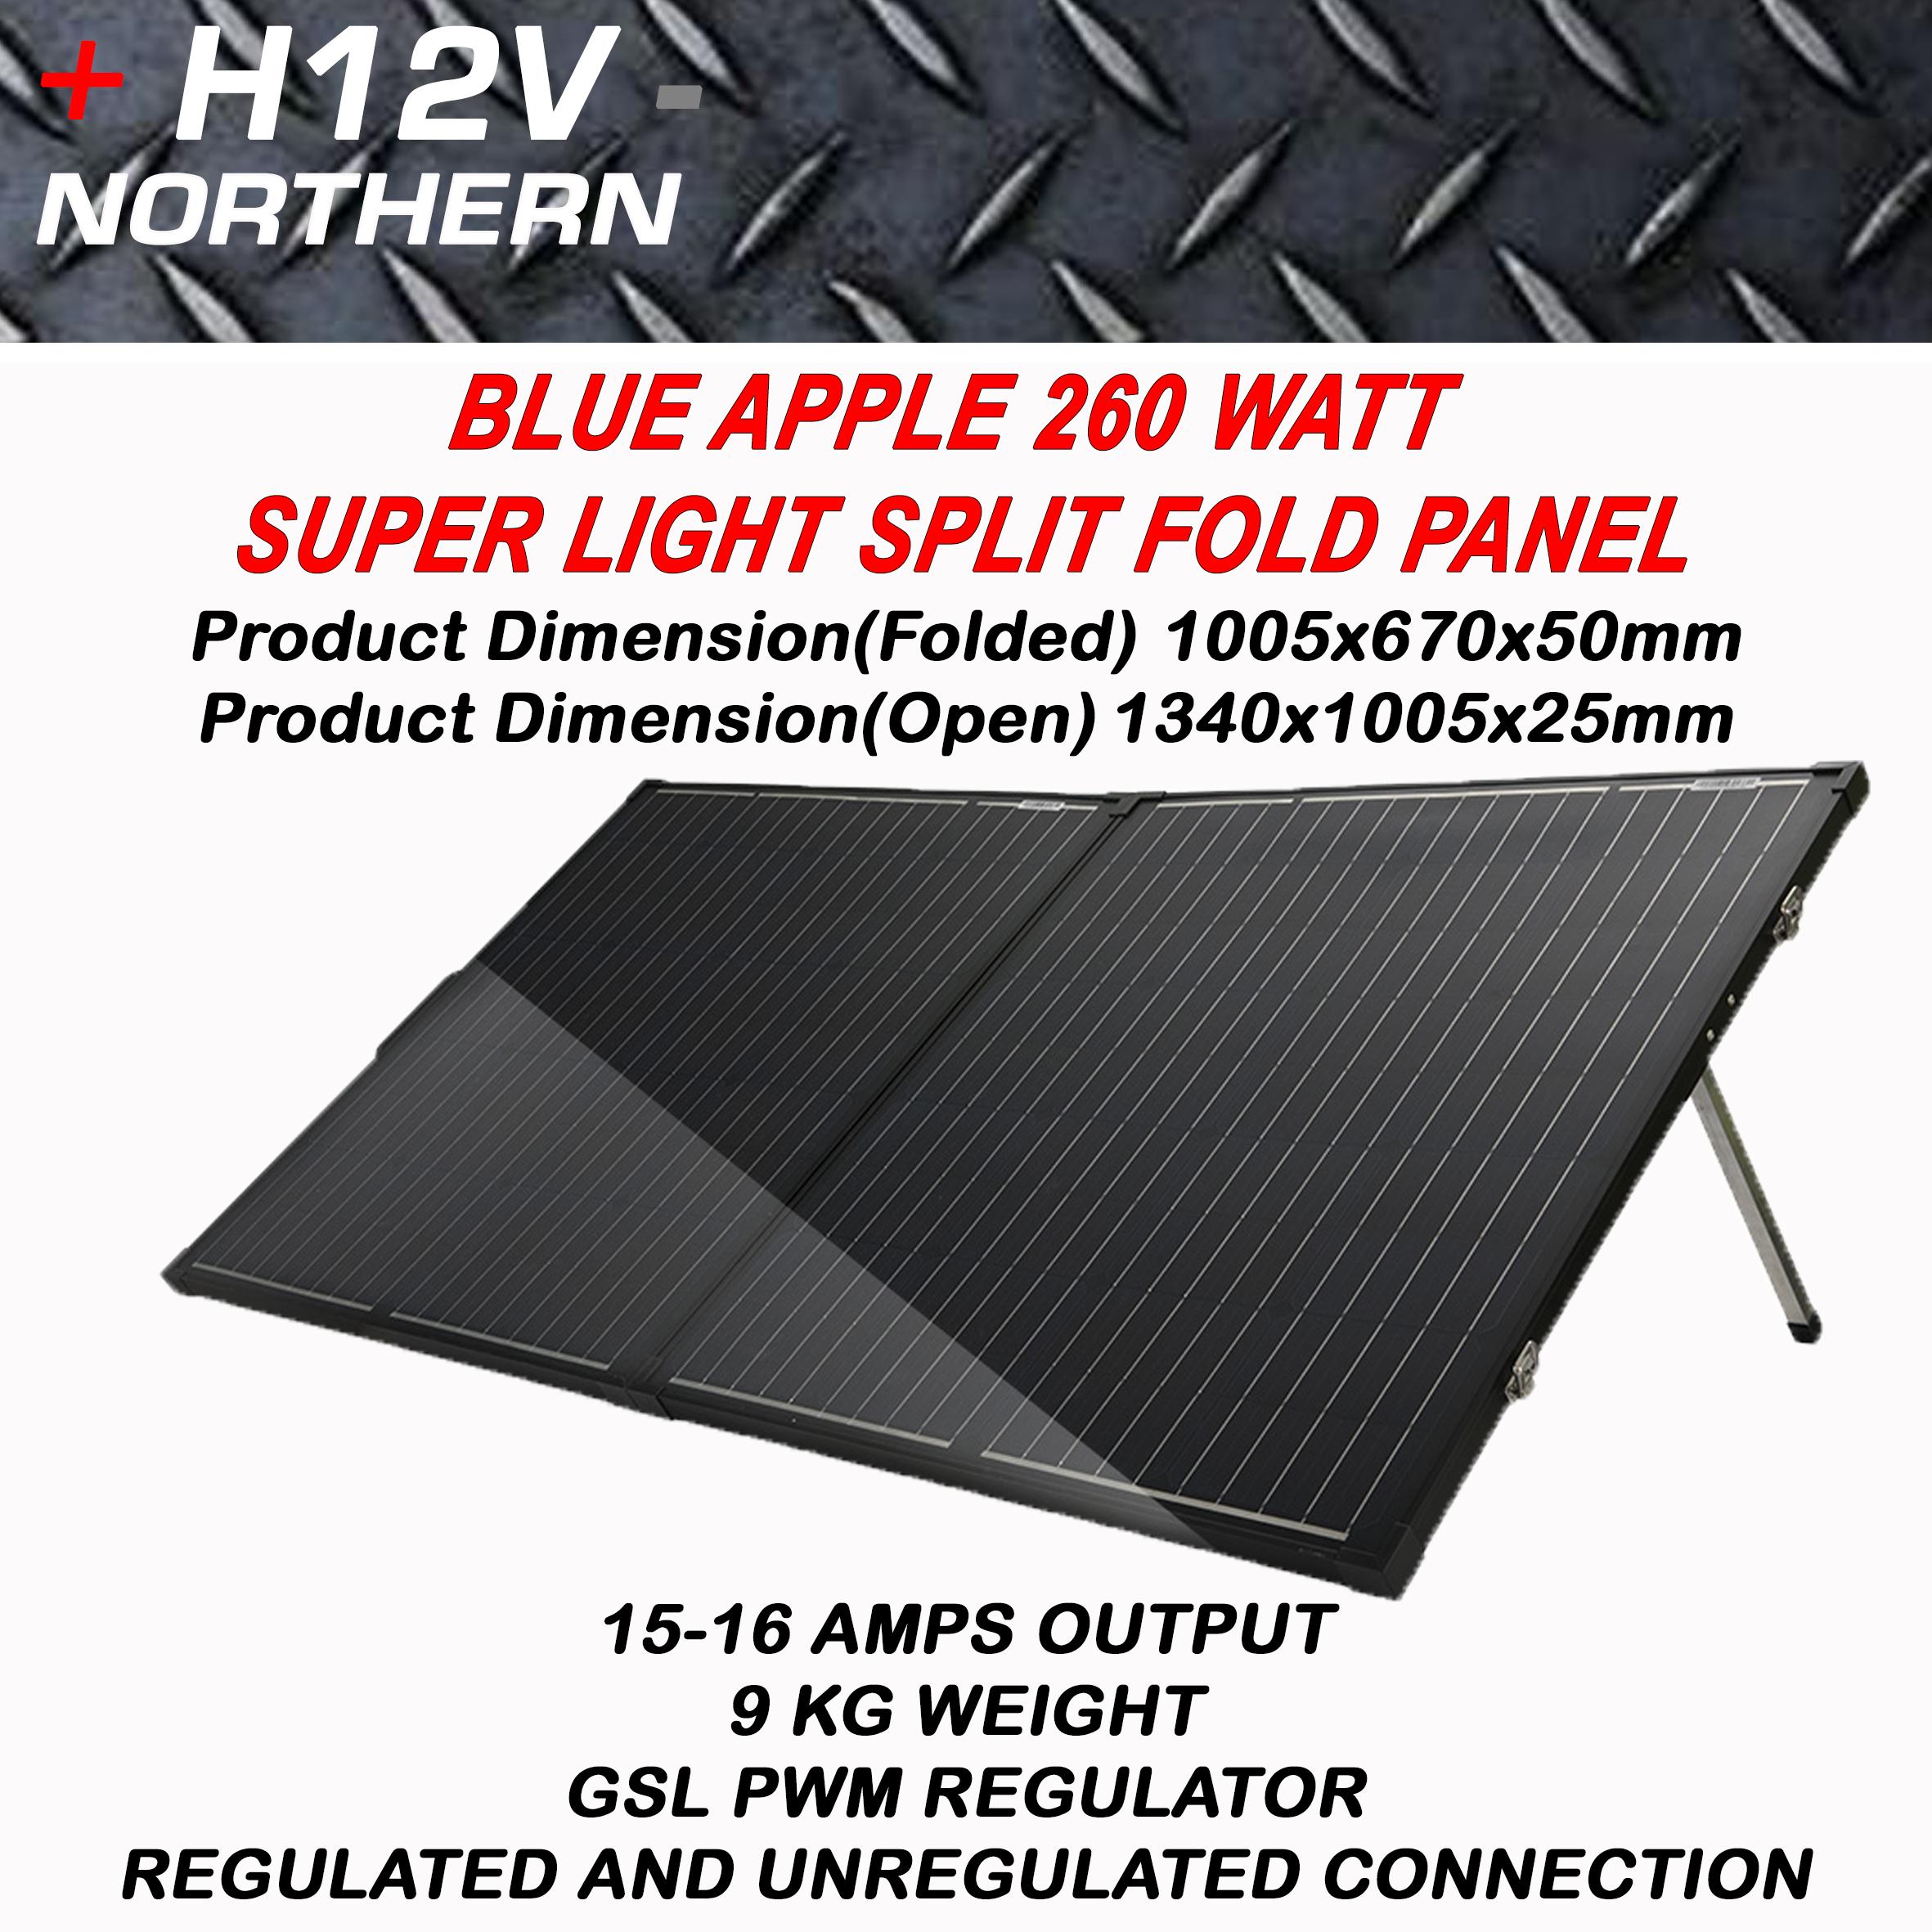 Blue Apple 260 Watt Super Thin Portable Split Fold Panel